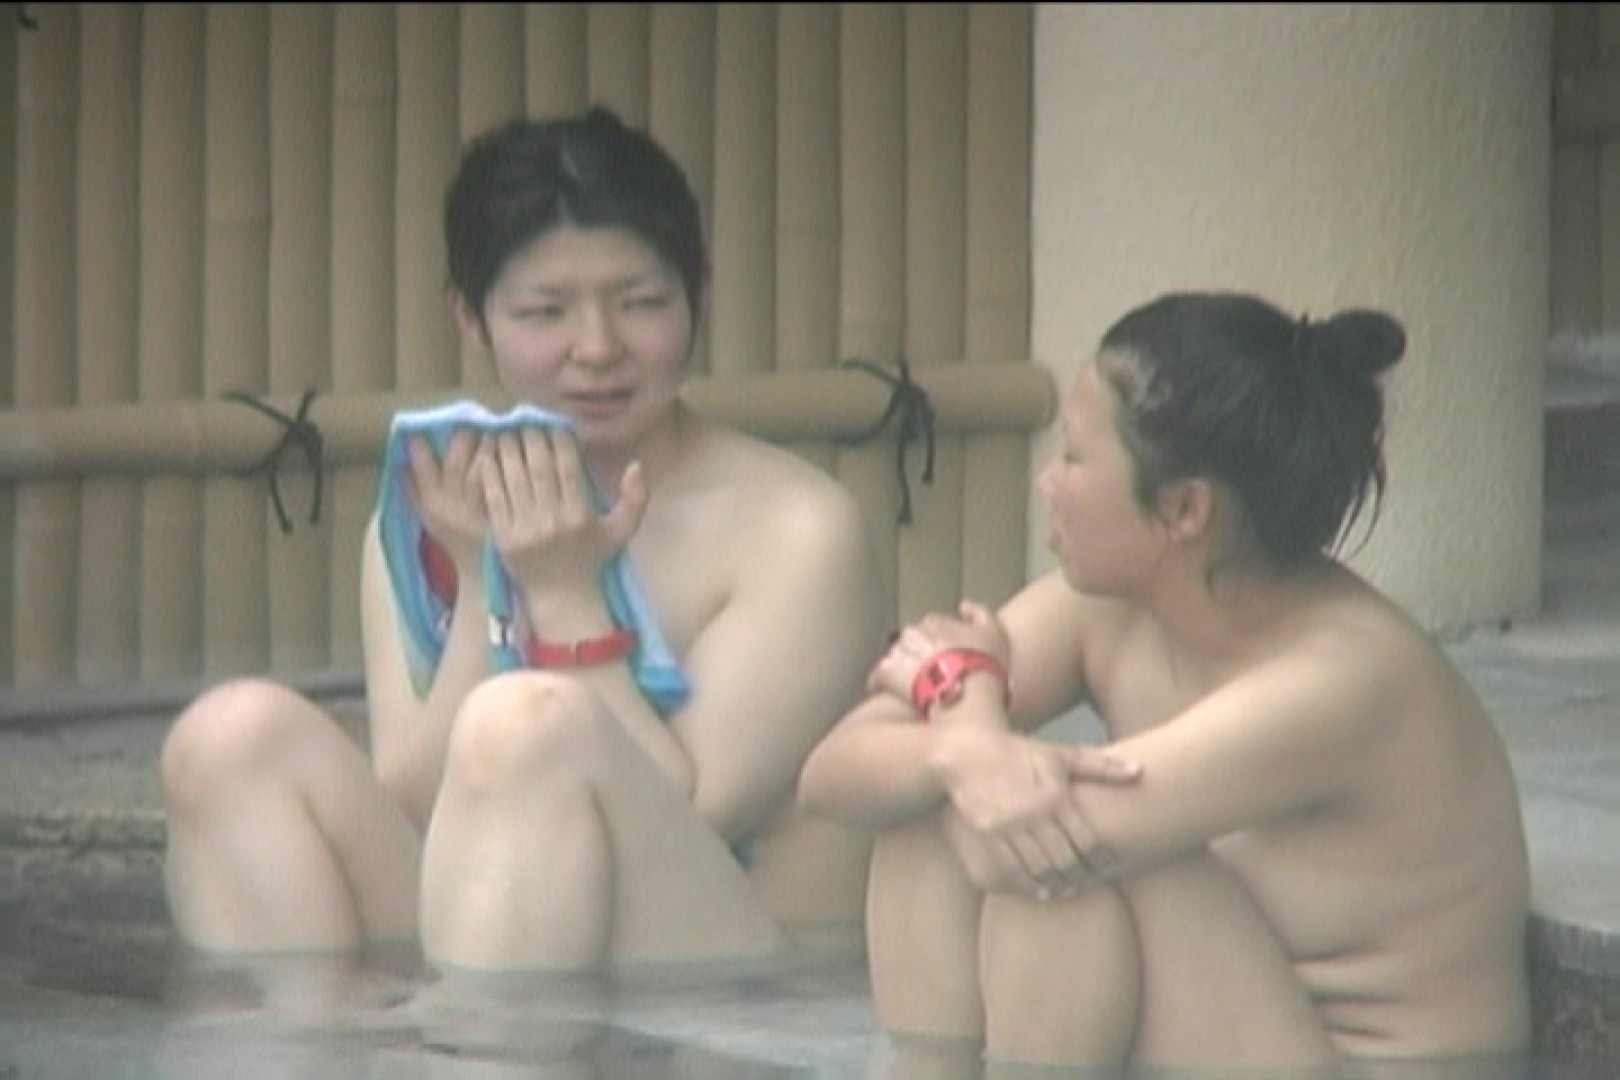 Aquaな露天風呂Vol.139 盗撮 | HなOL  53pic 9